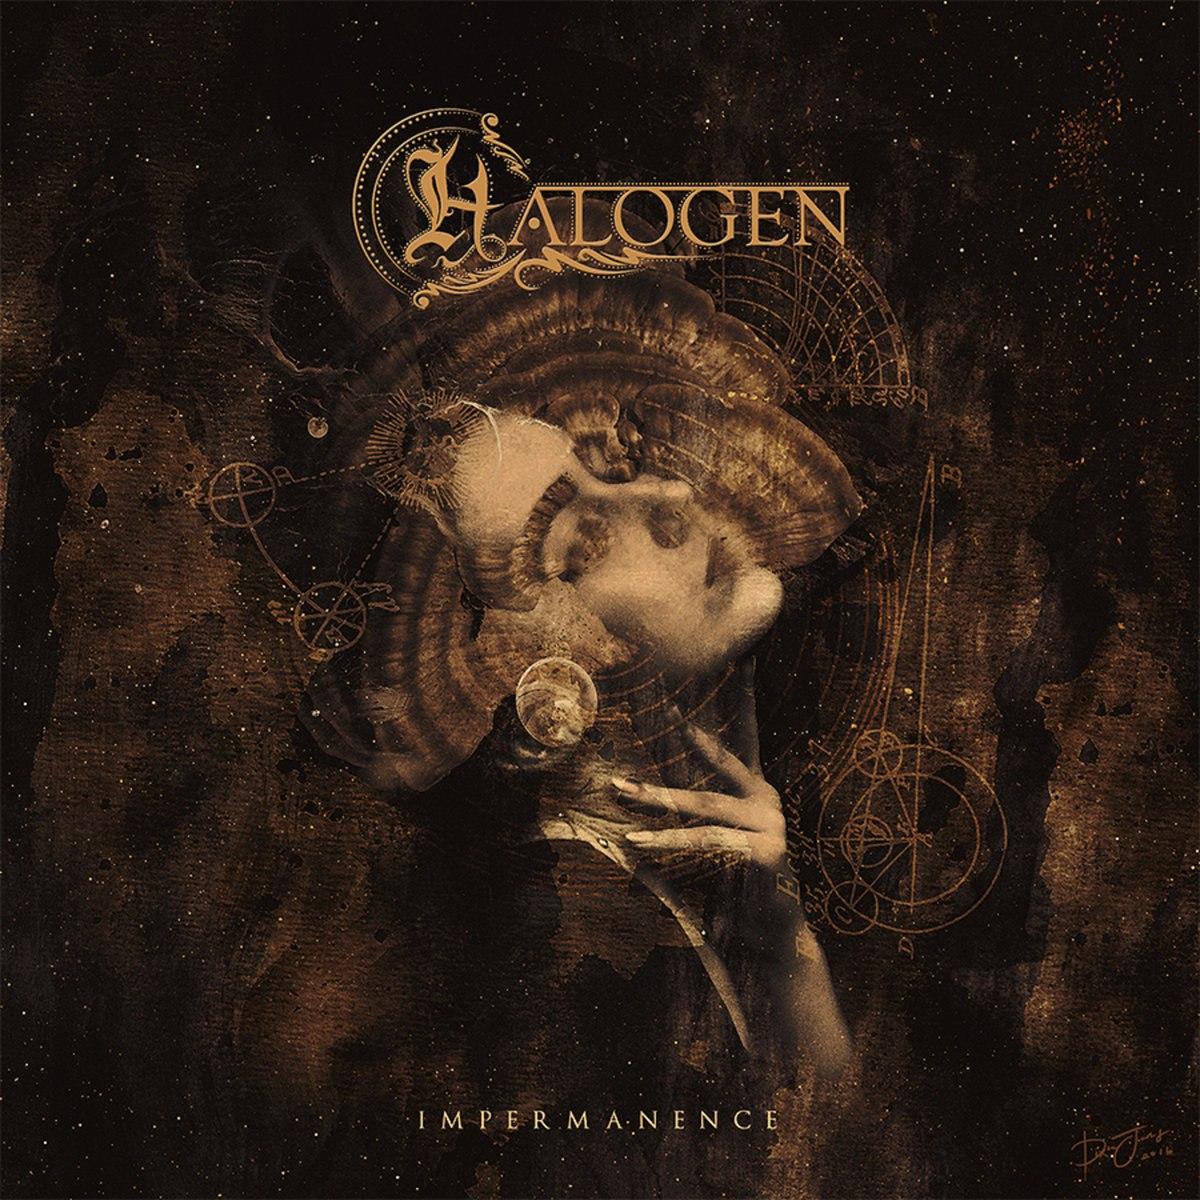 Halogen - Descension [Single] (2016)